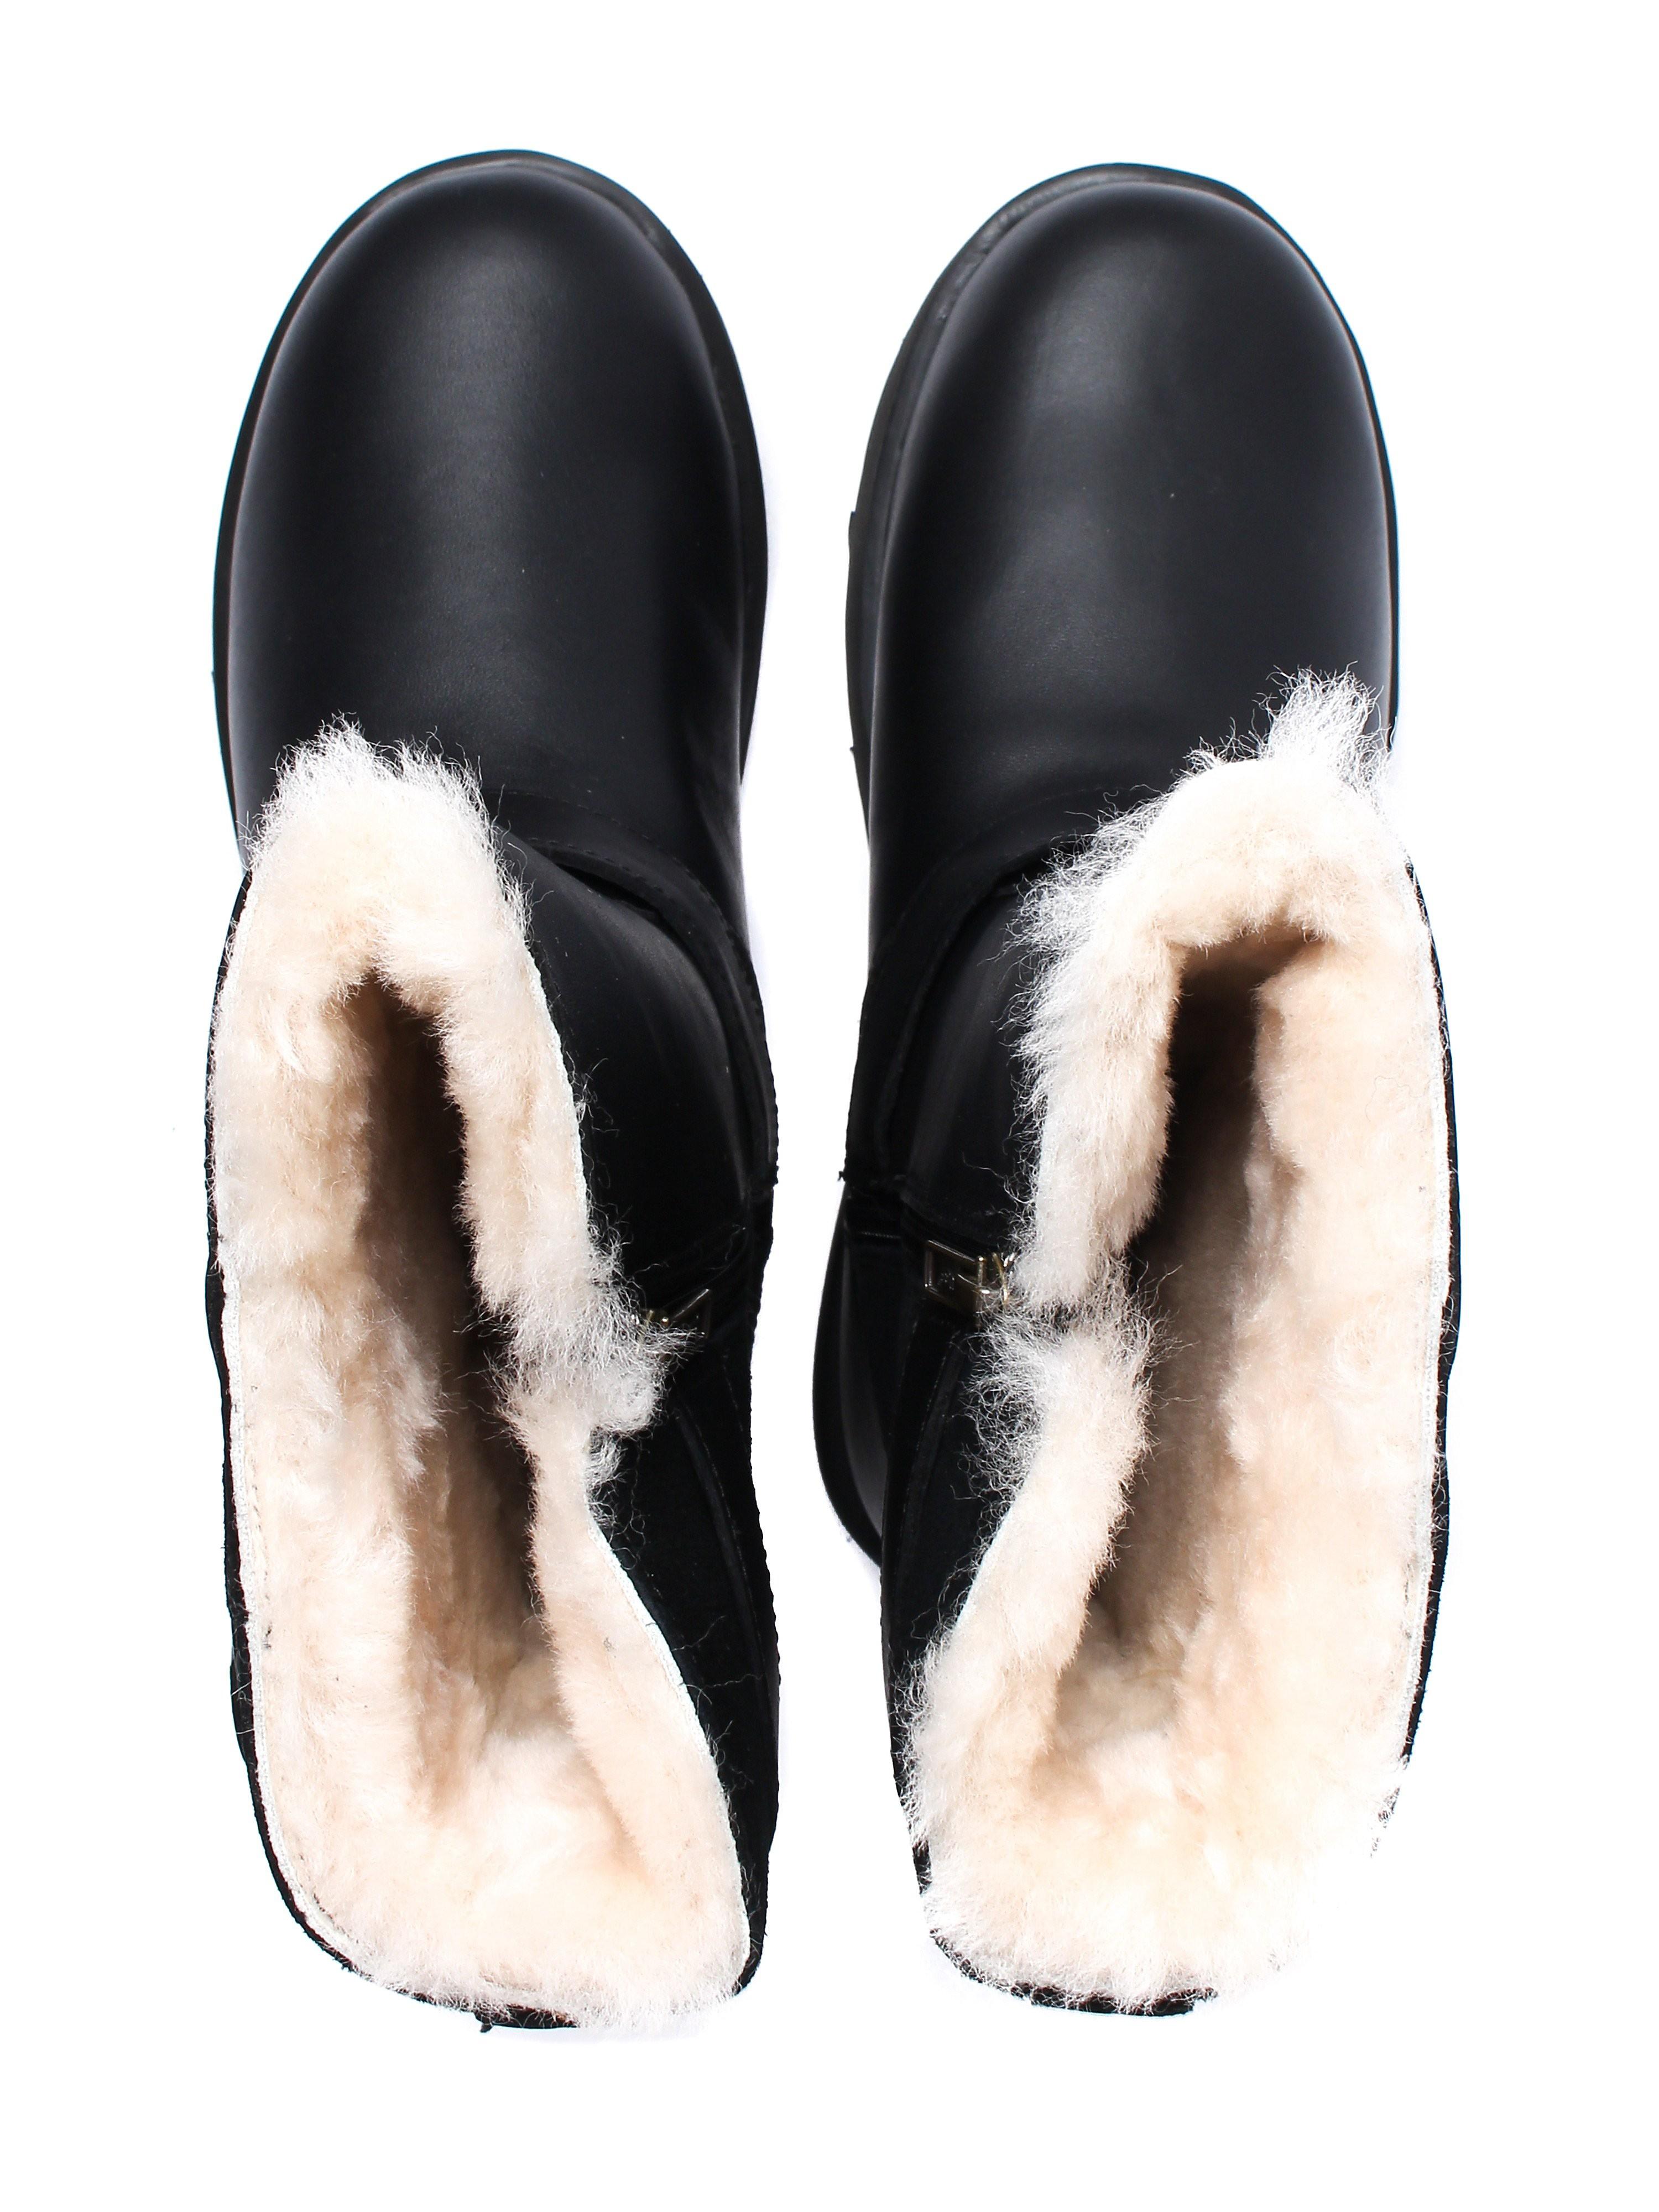 UGG Women's Waterproof Breida Boots - Black Leather